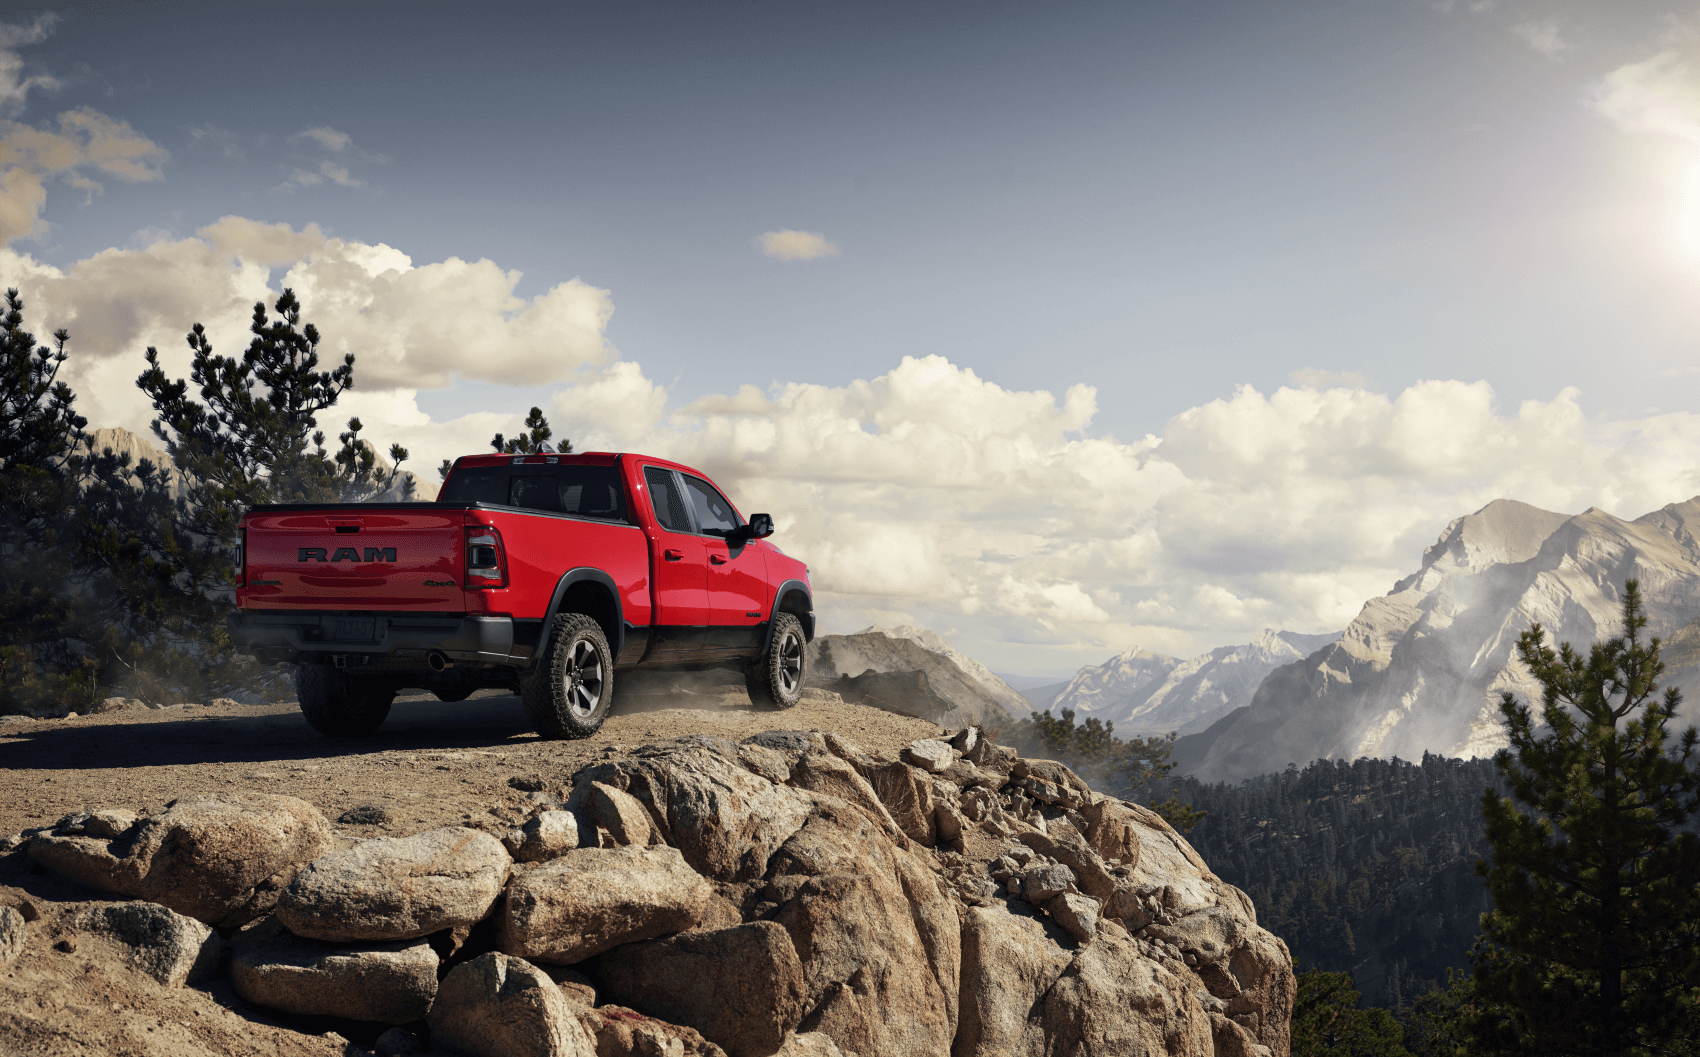 2021 Ram 1500 Rebel Flame Red Distant Mountain C. Harper CDJR